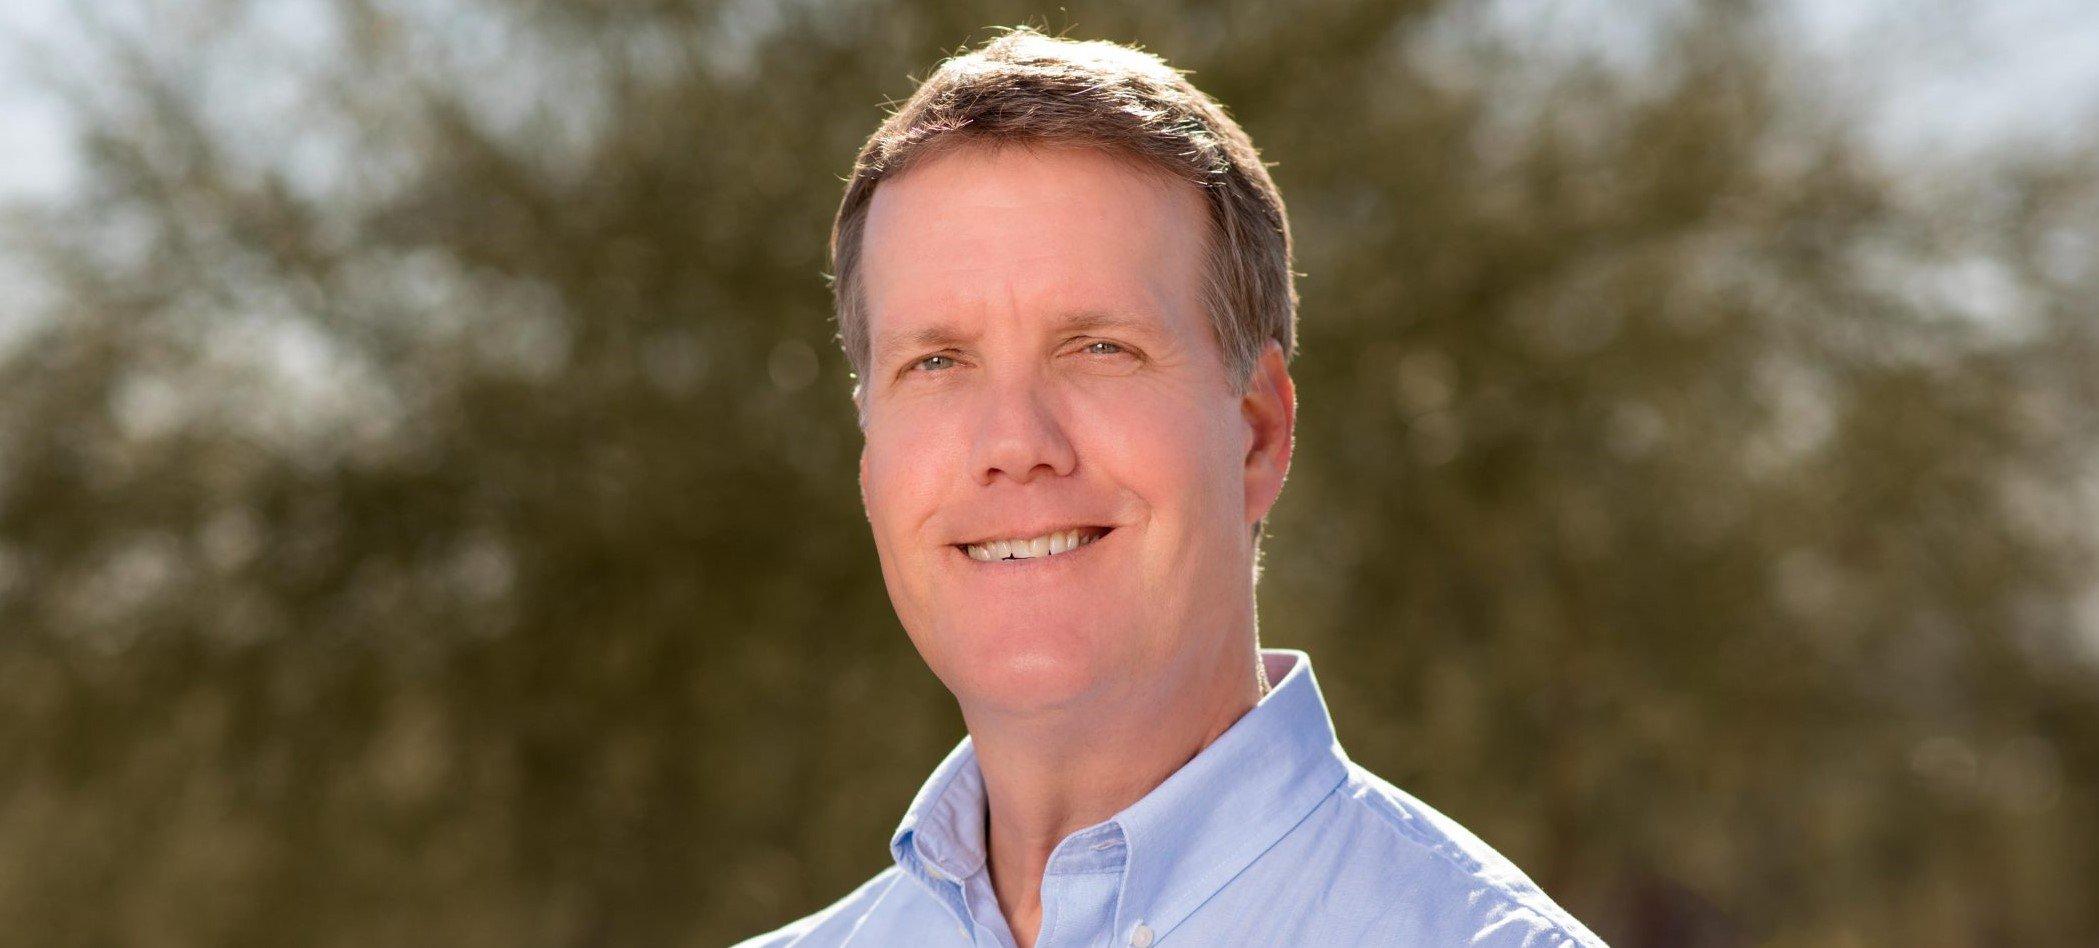 Educator and Community Stalwart Rex Scott  is Running for Pima Supervisor, District 1